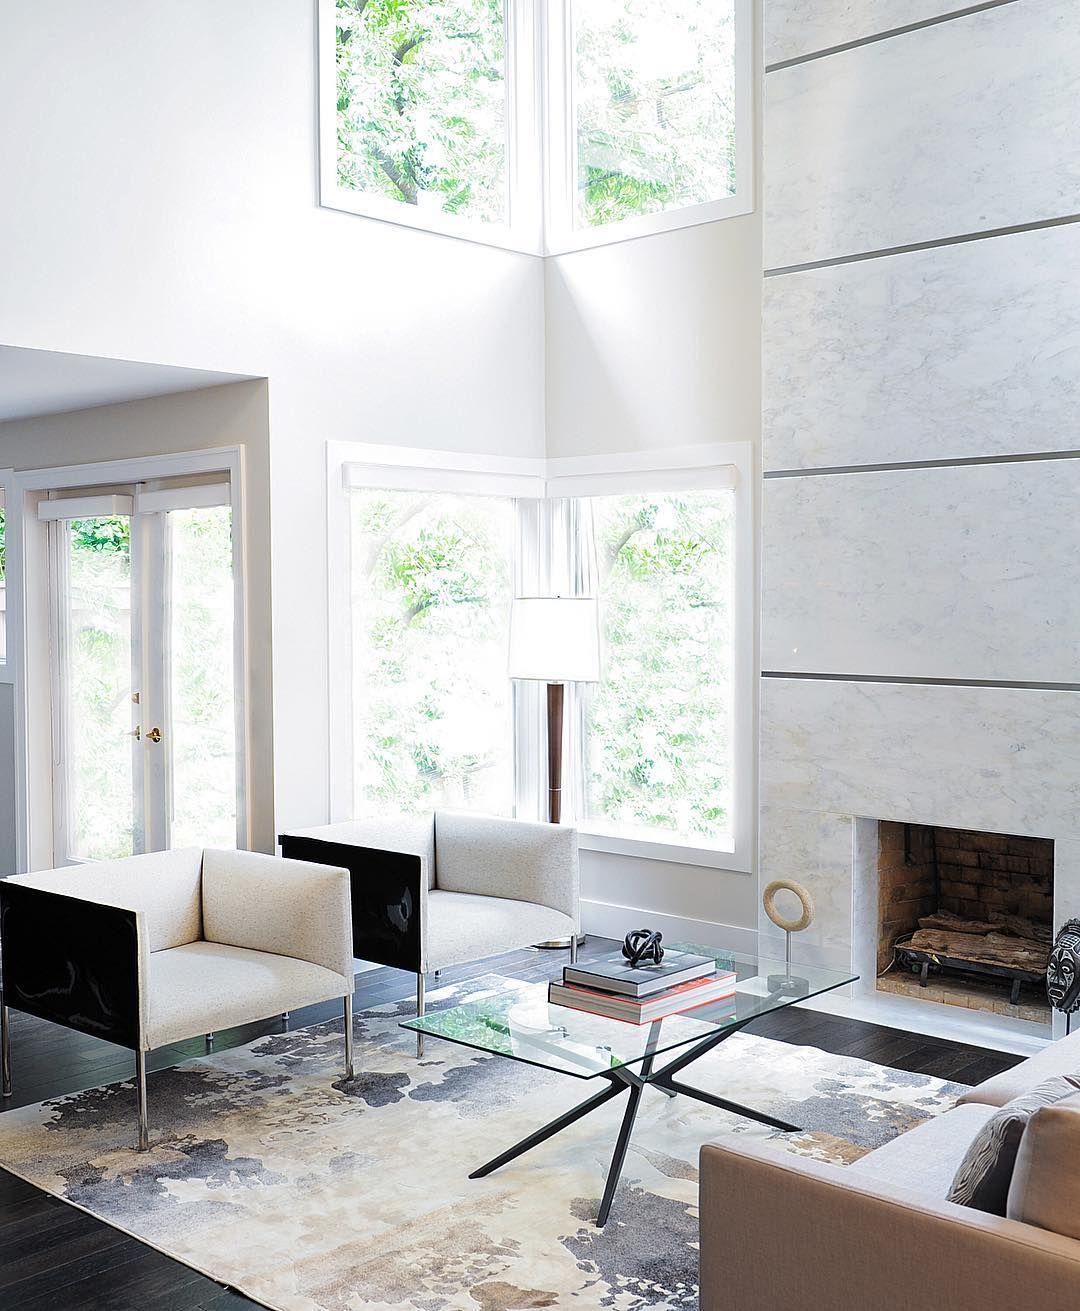 Window house design ideas  pin by l t a y l o r on h o m e  pinterest  corner windows living